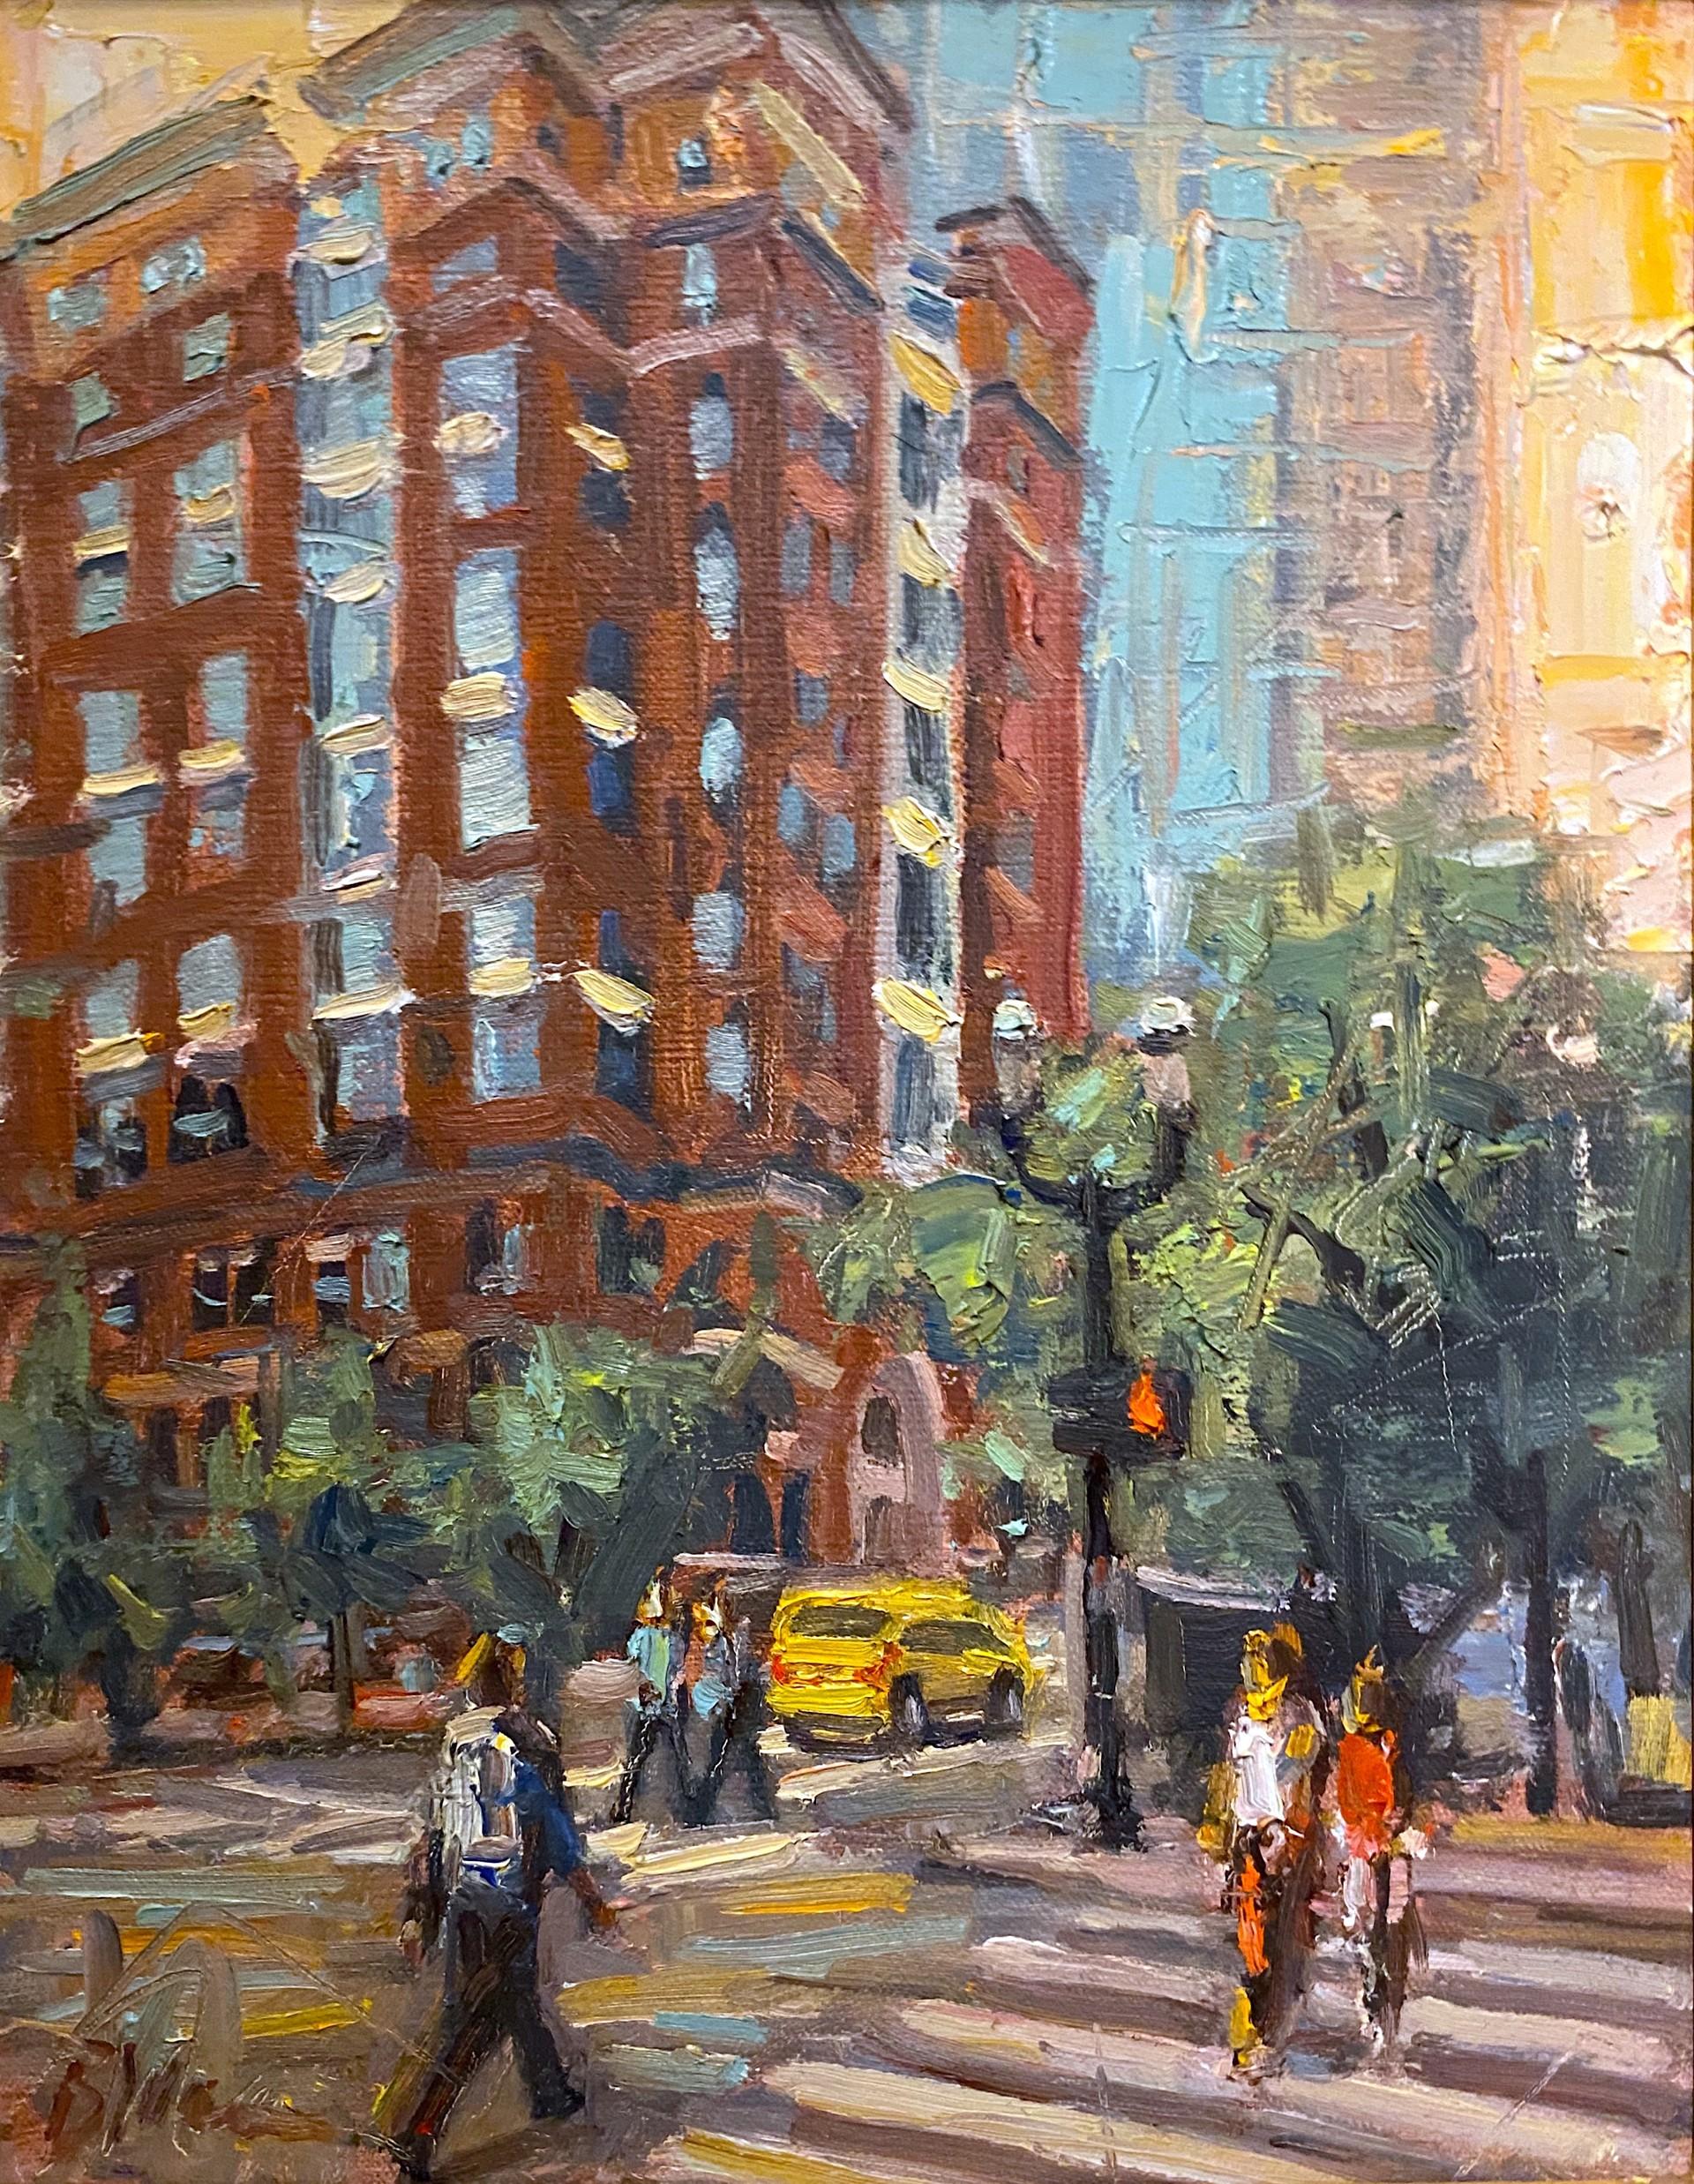 First Bank Study (Downtown) by Brett Weaver